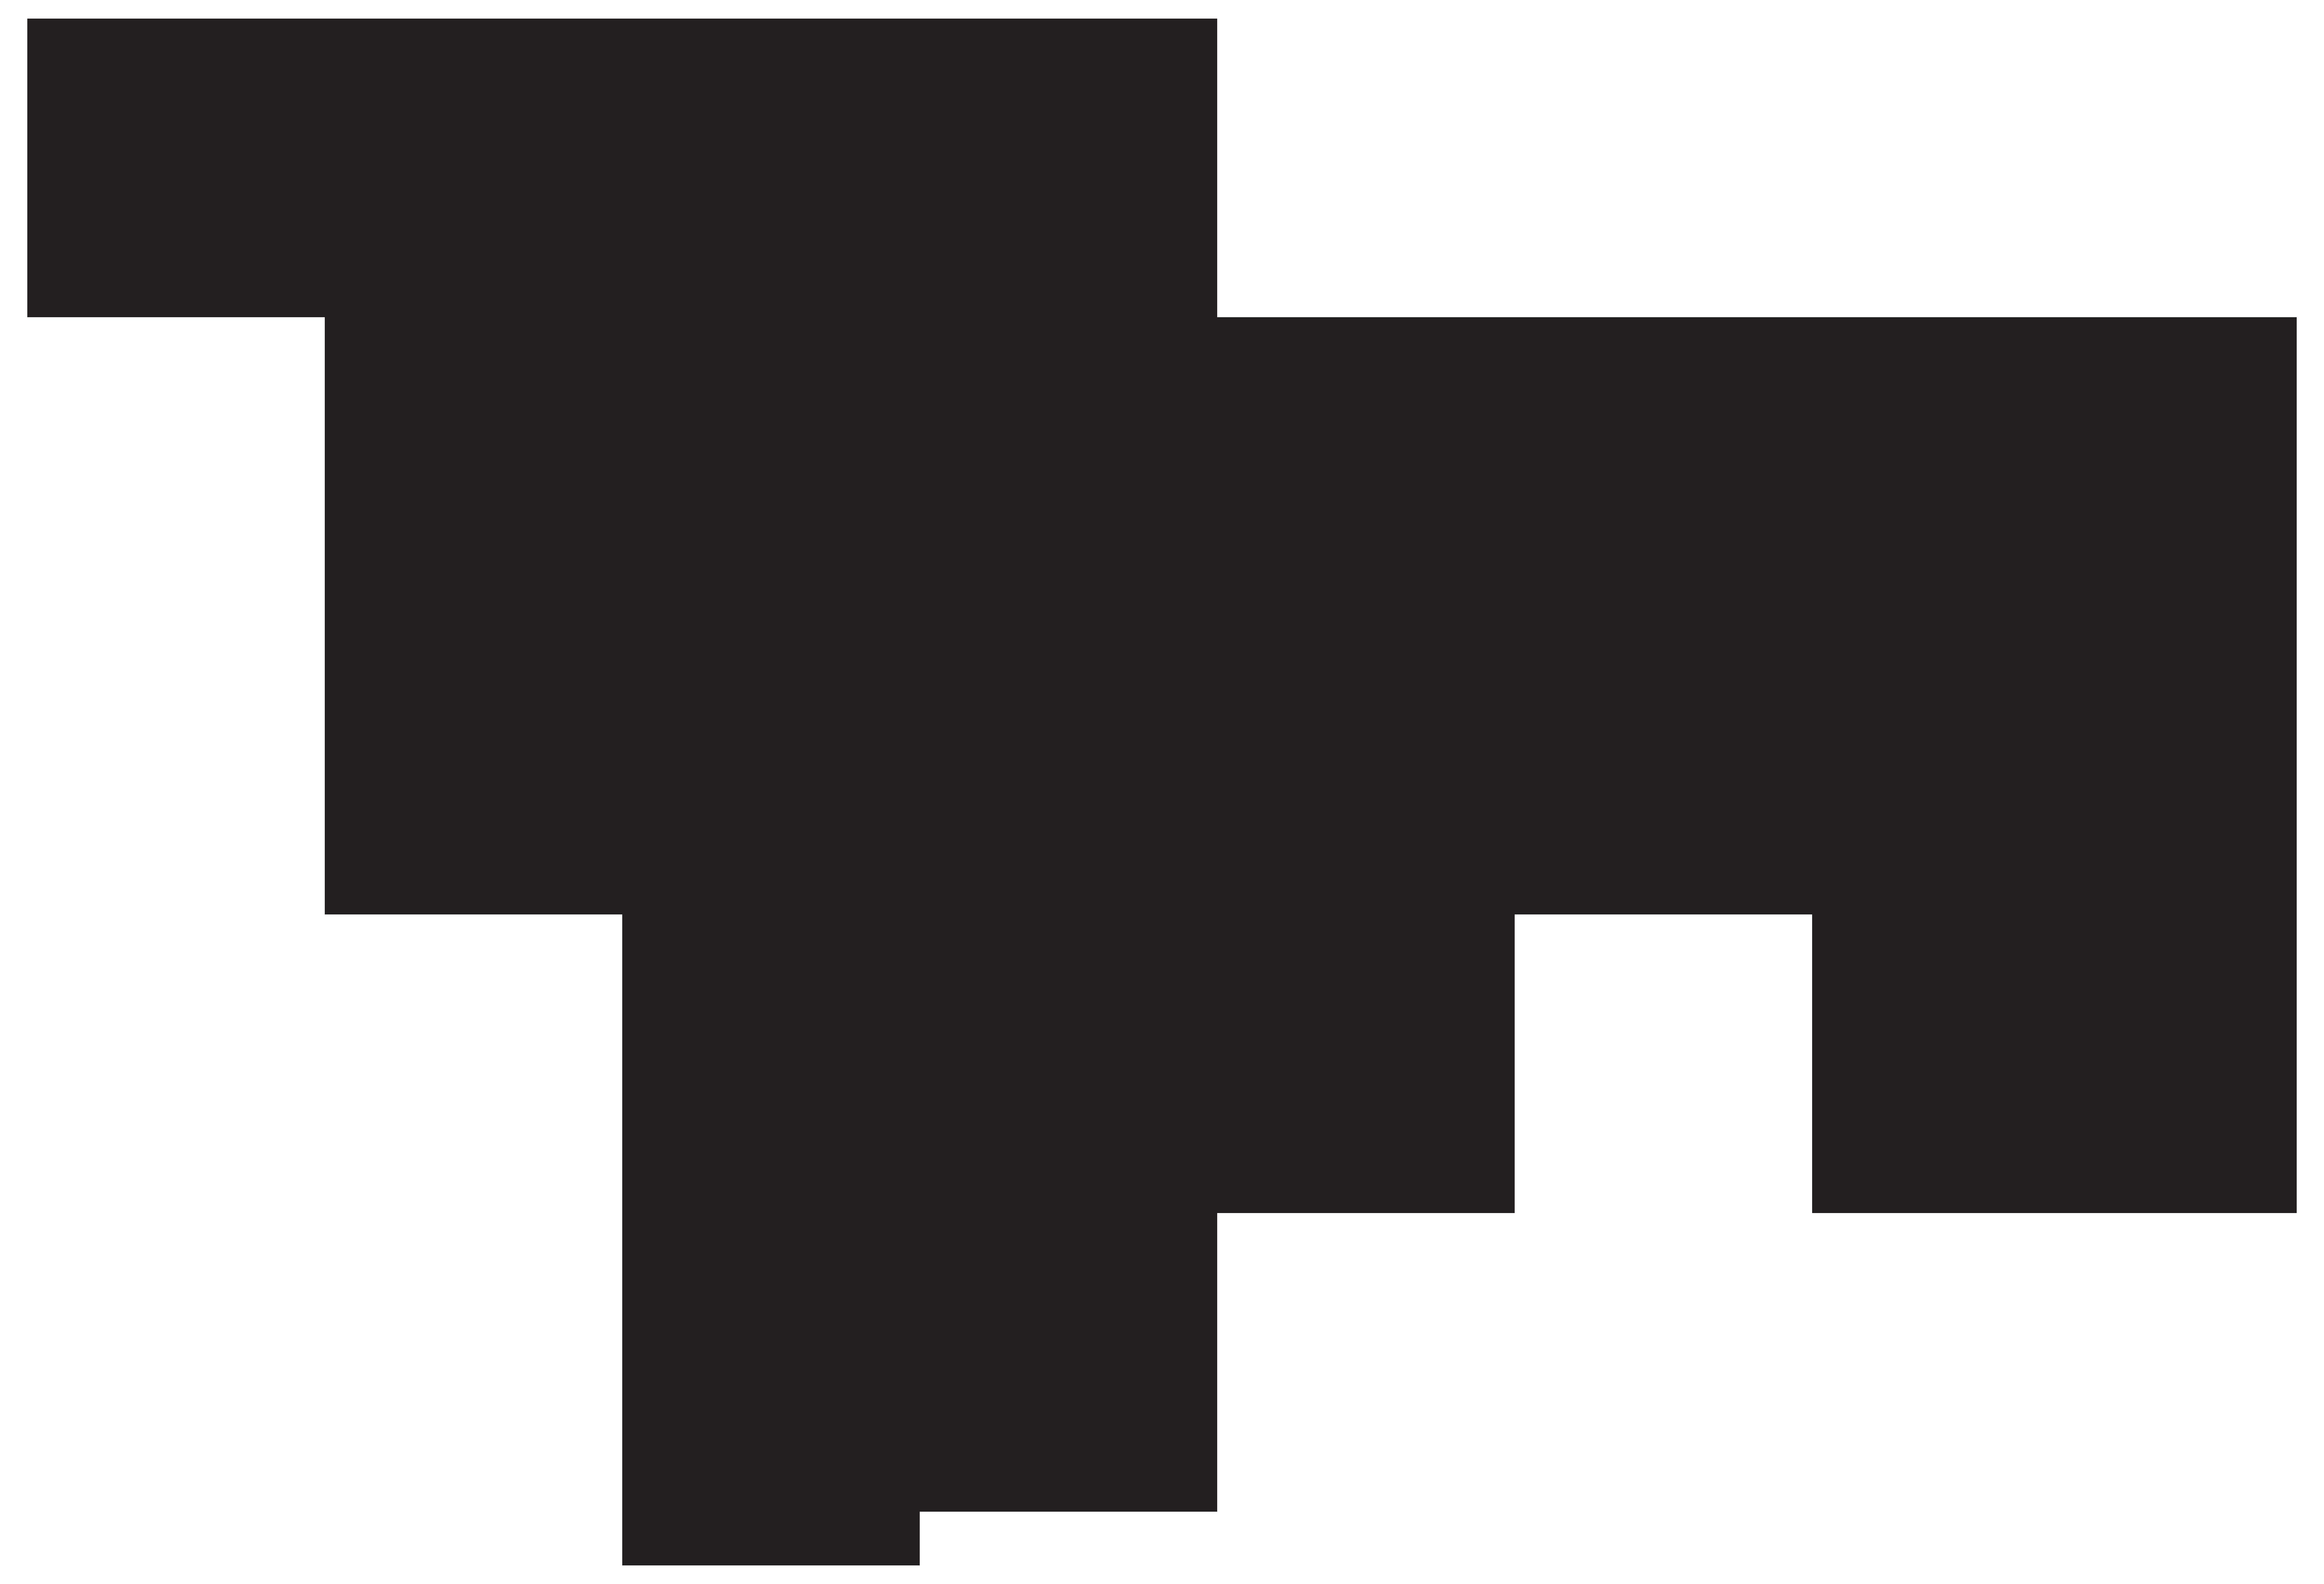 Clipart grackle clipart library stock Bird,Beak,Crow,Raven,raven,New caledonian crow,Silhouette,Rook,Crow ... clipart library stock